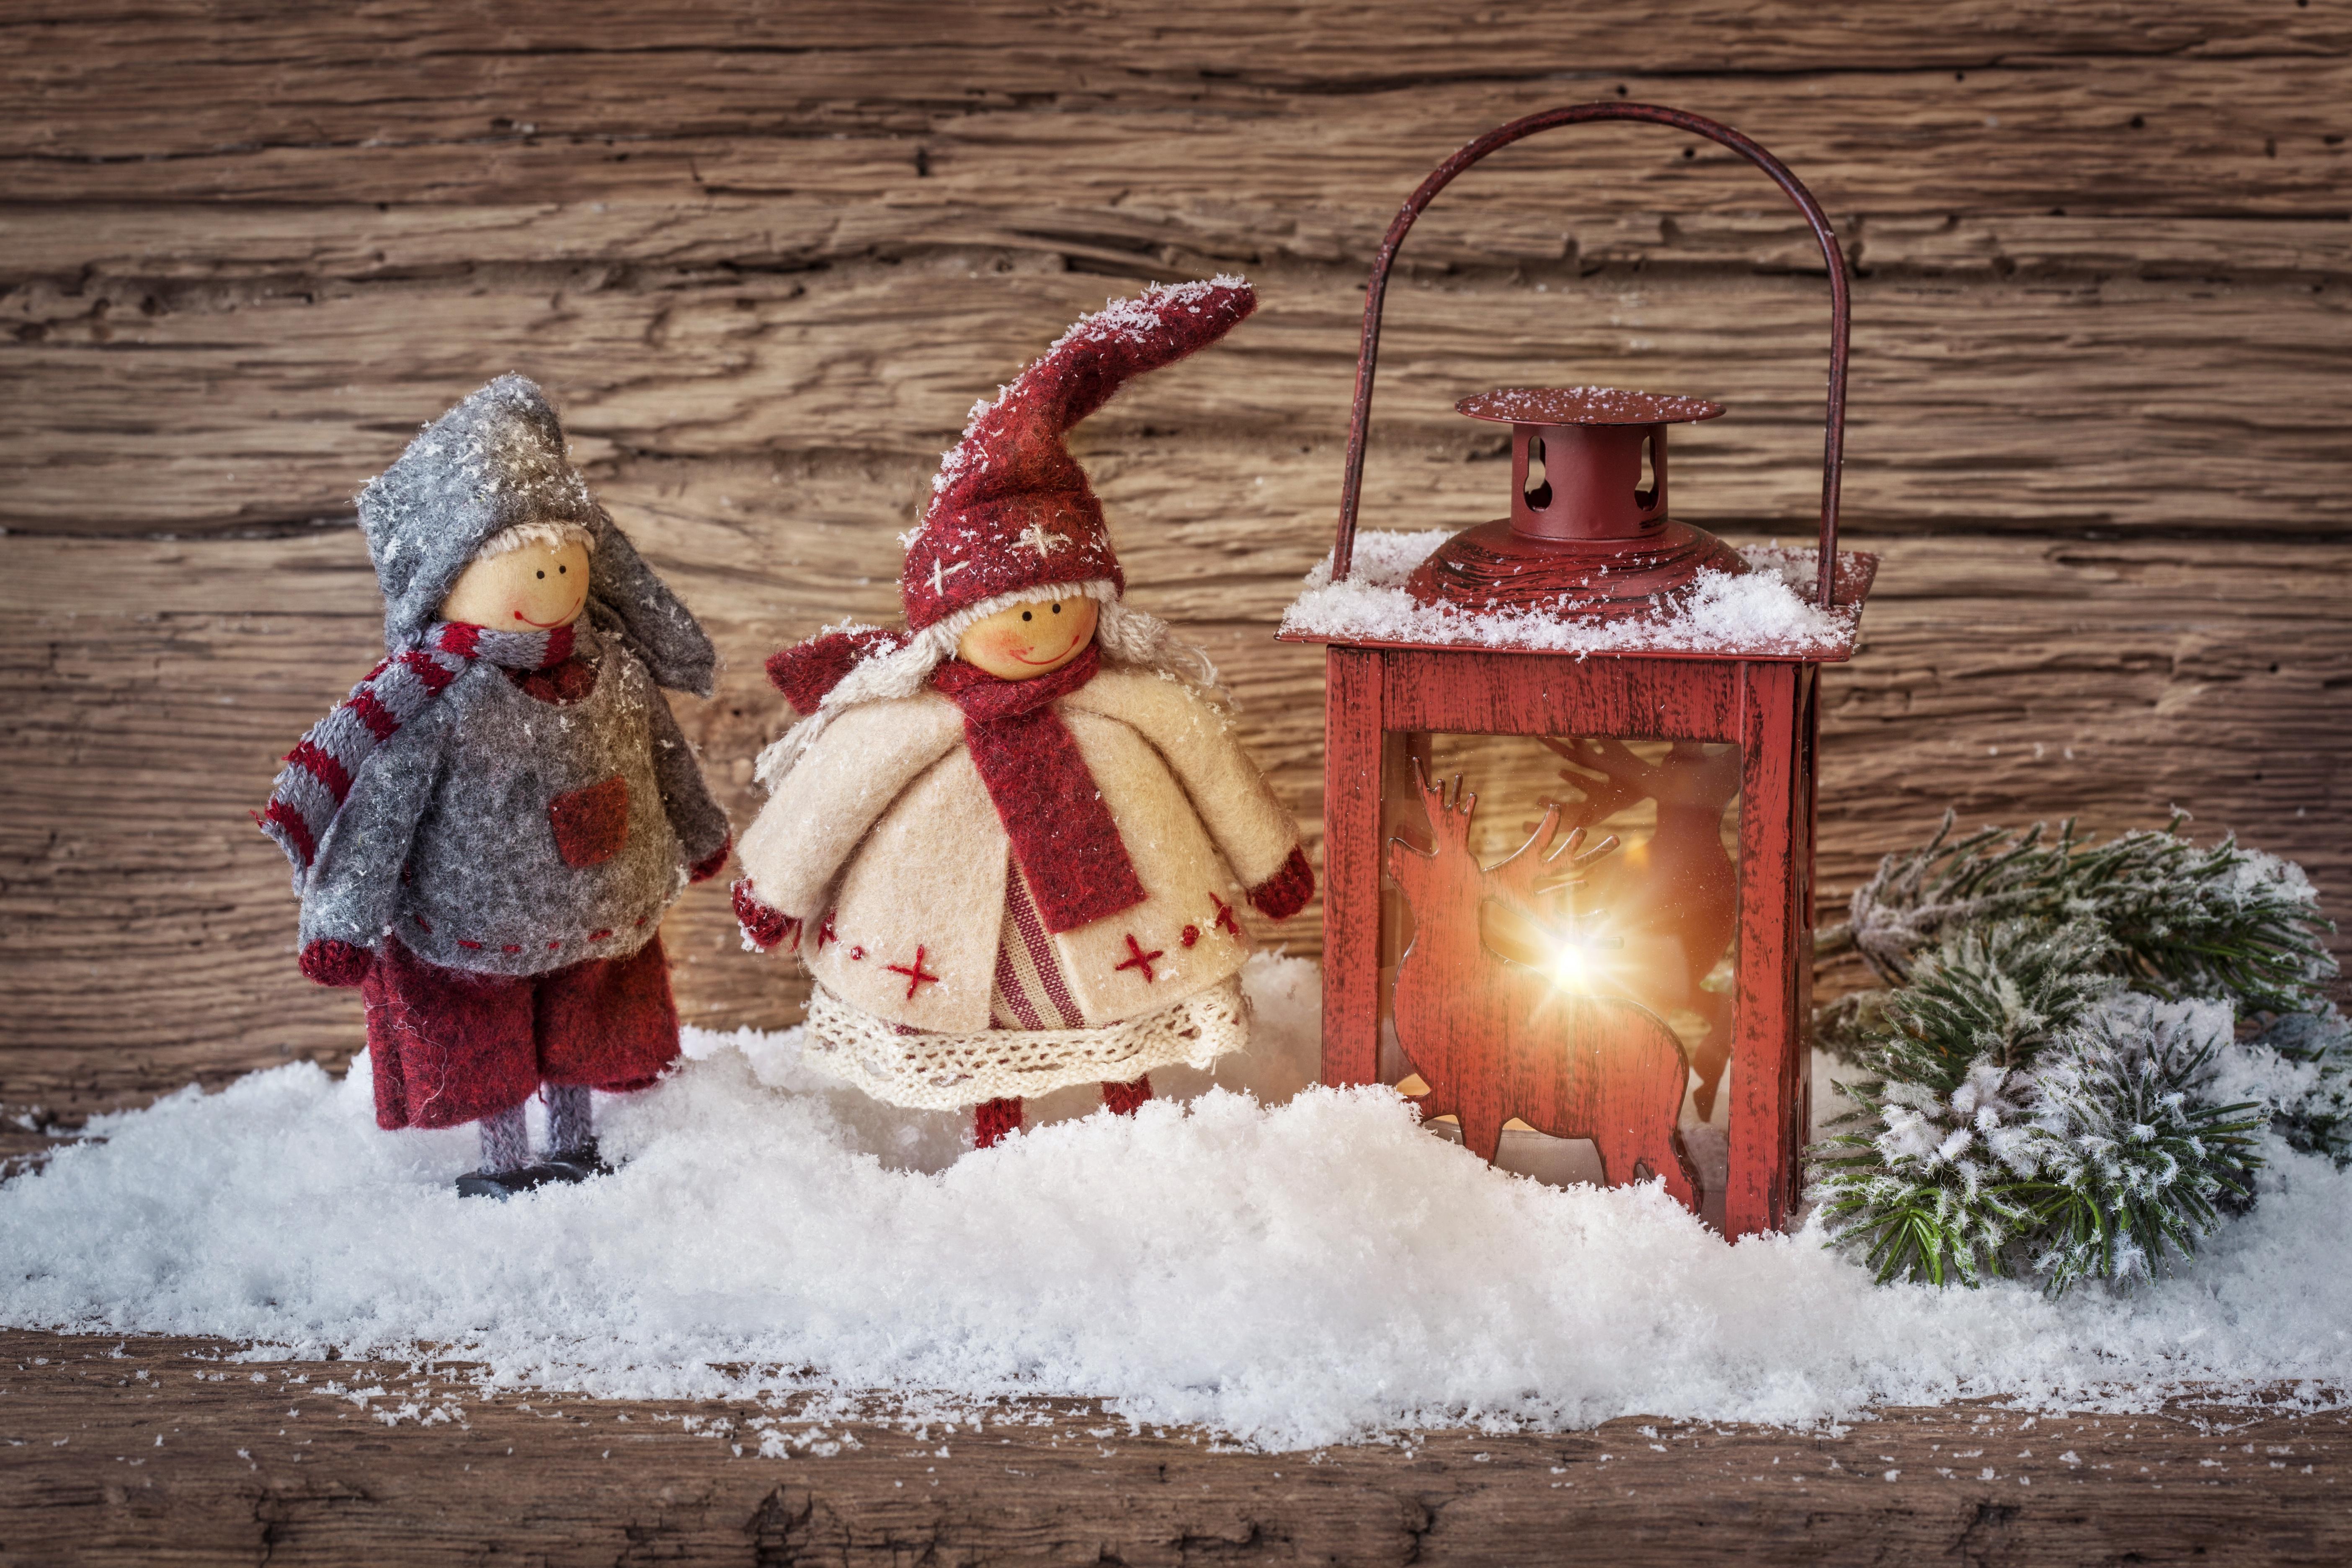 Lantern merry christmas toys snow new year new year ...